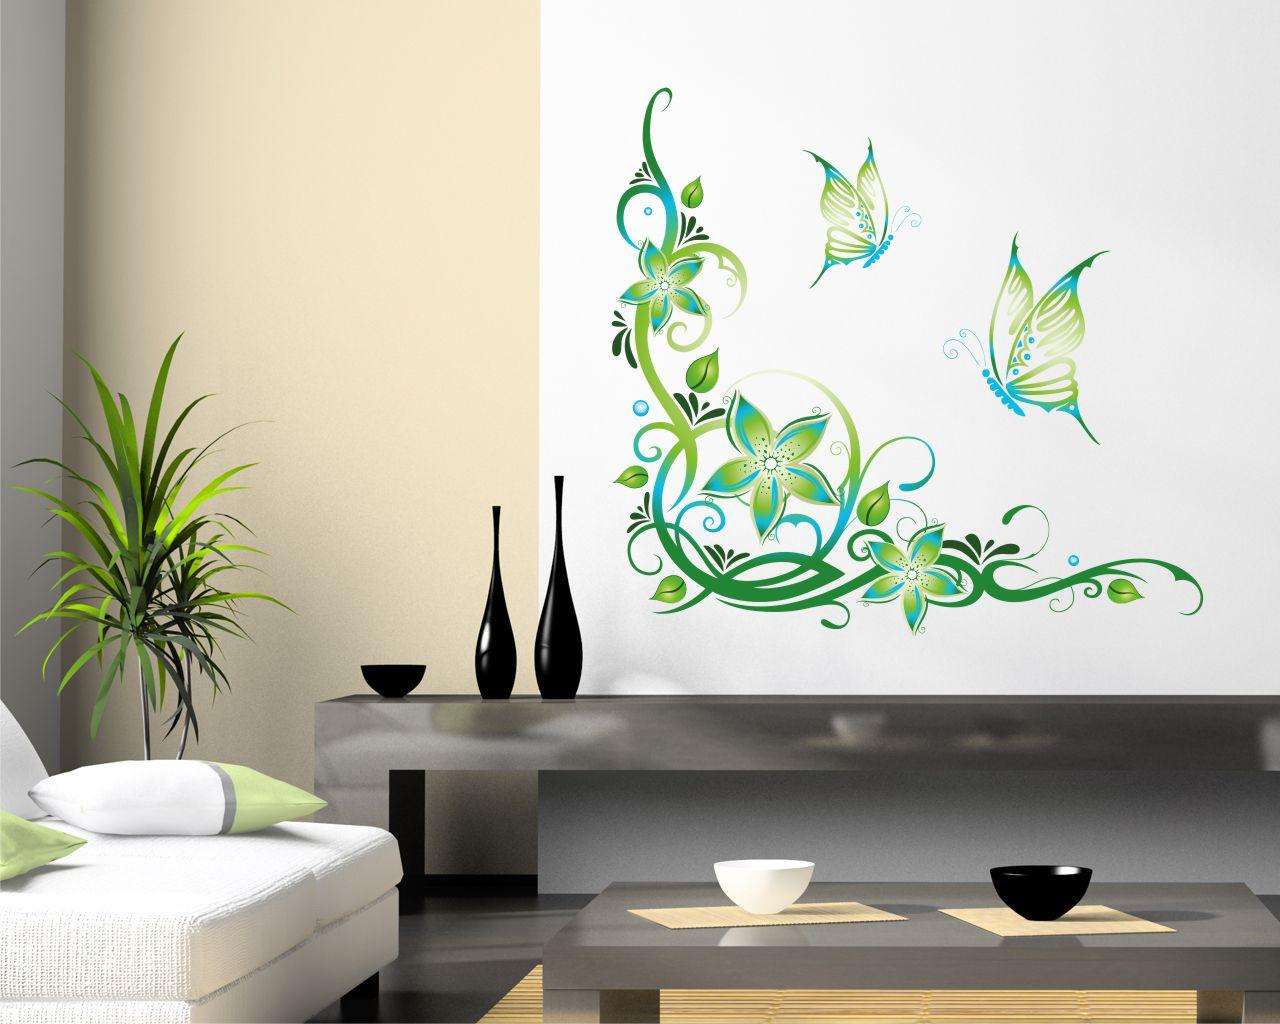 Farfalle tra decori floreali animali adesivo murale interni decori adesivi murali - Decori adesivi per pareti ...